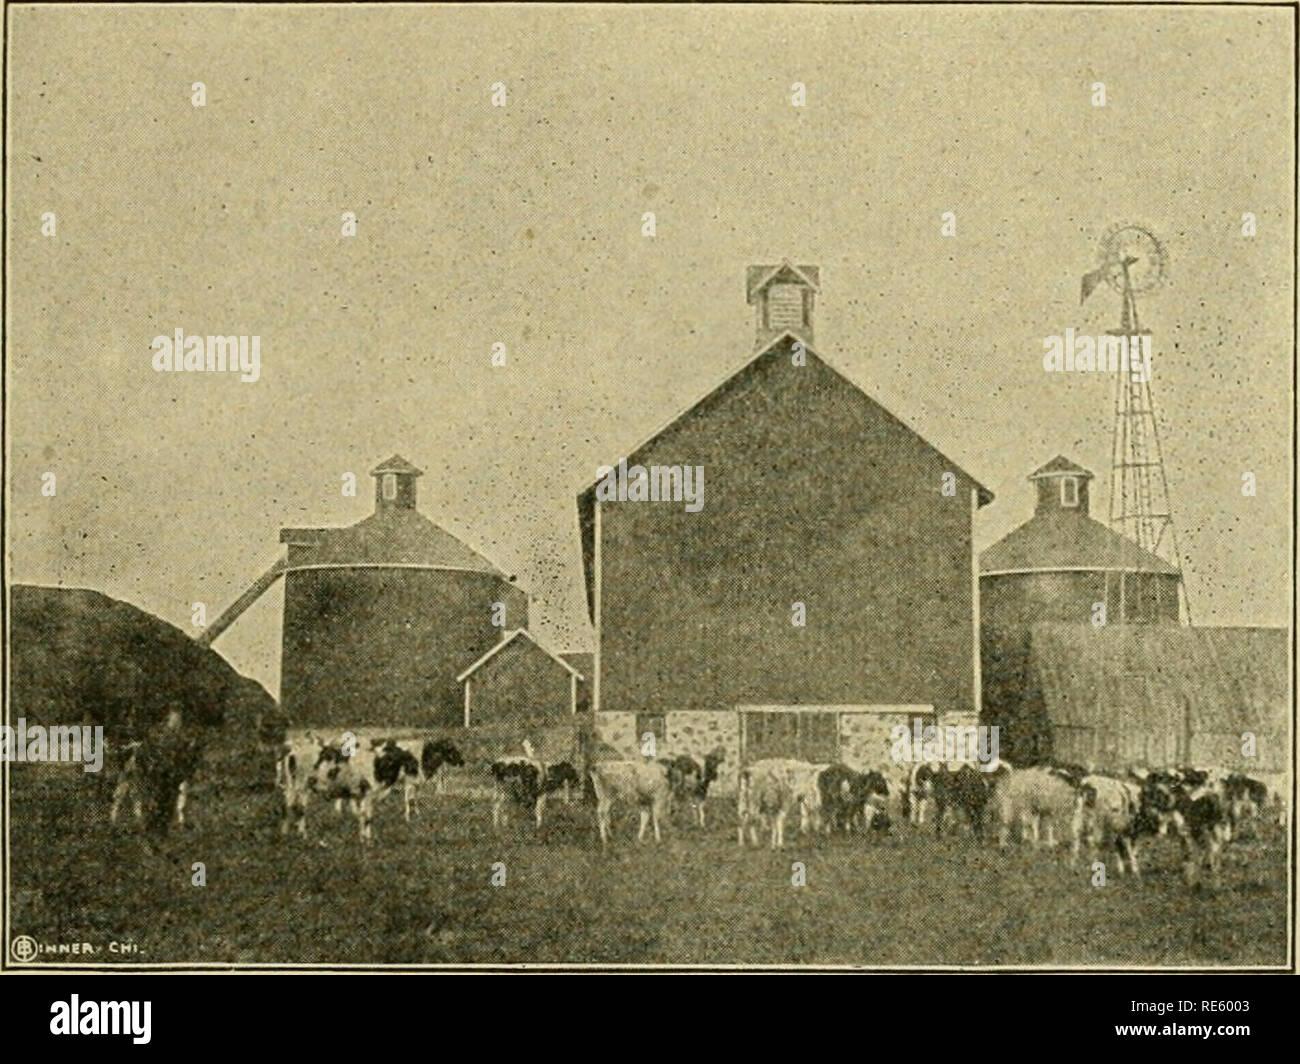 The creamery patron's handbook  Dairying  BUILDING SILOS AND